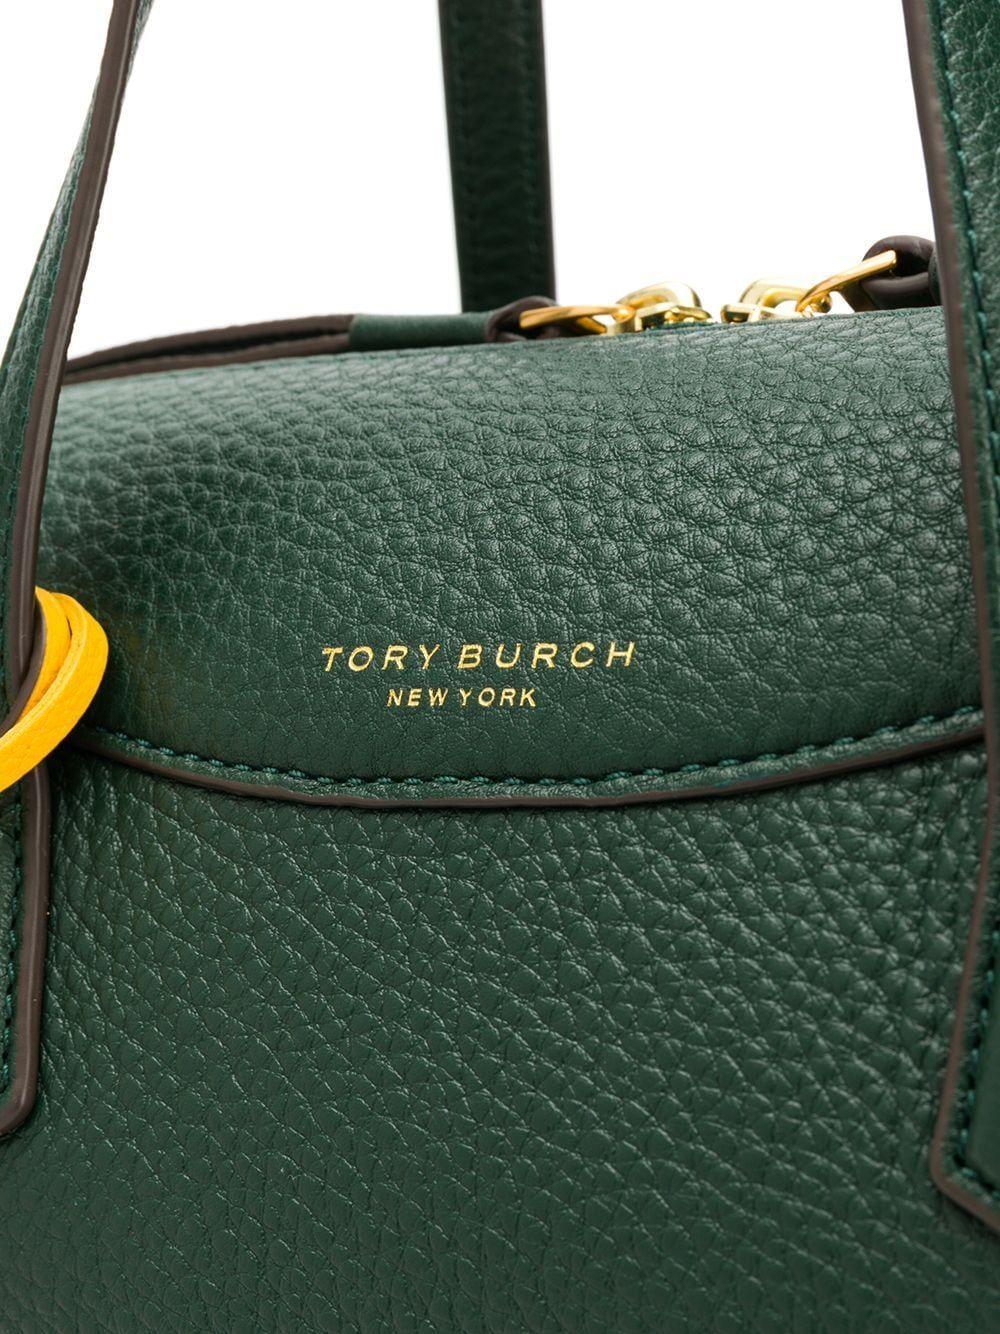 TORY BURCH WOMEN'S 61169304 GREEN LEATHER HANDBAG